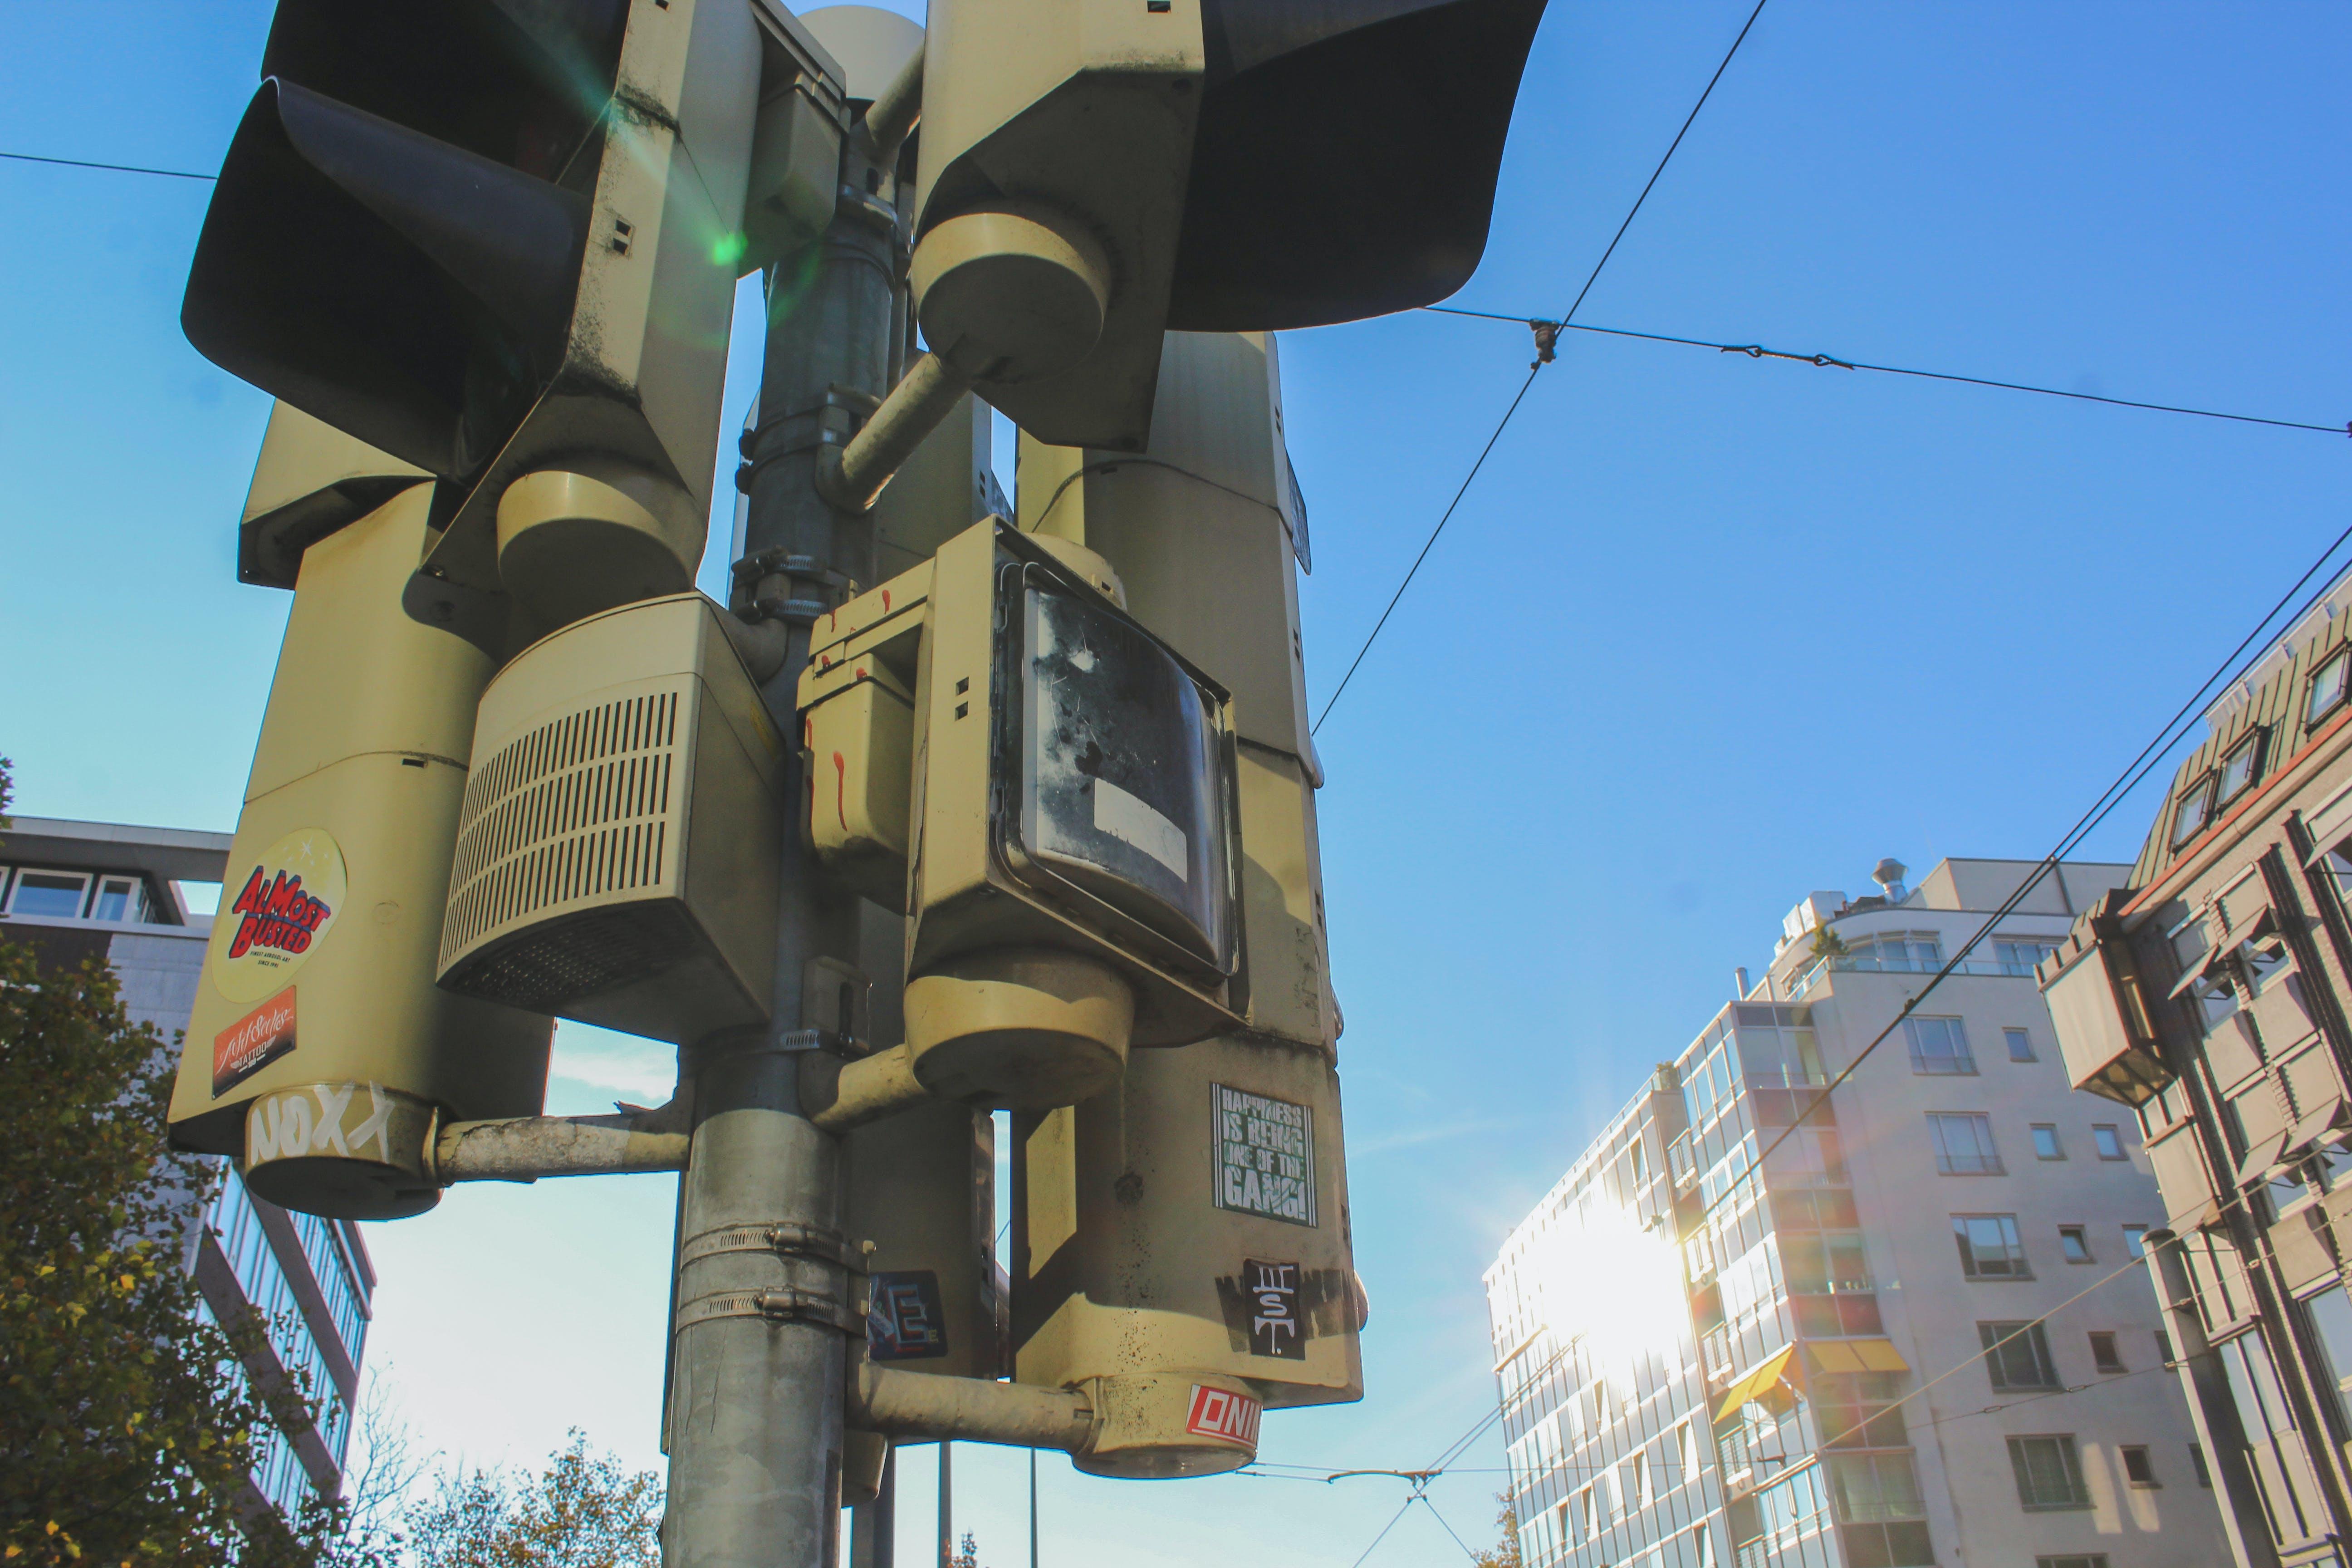 traffic jam, traffic light